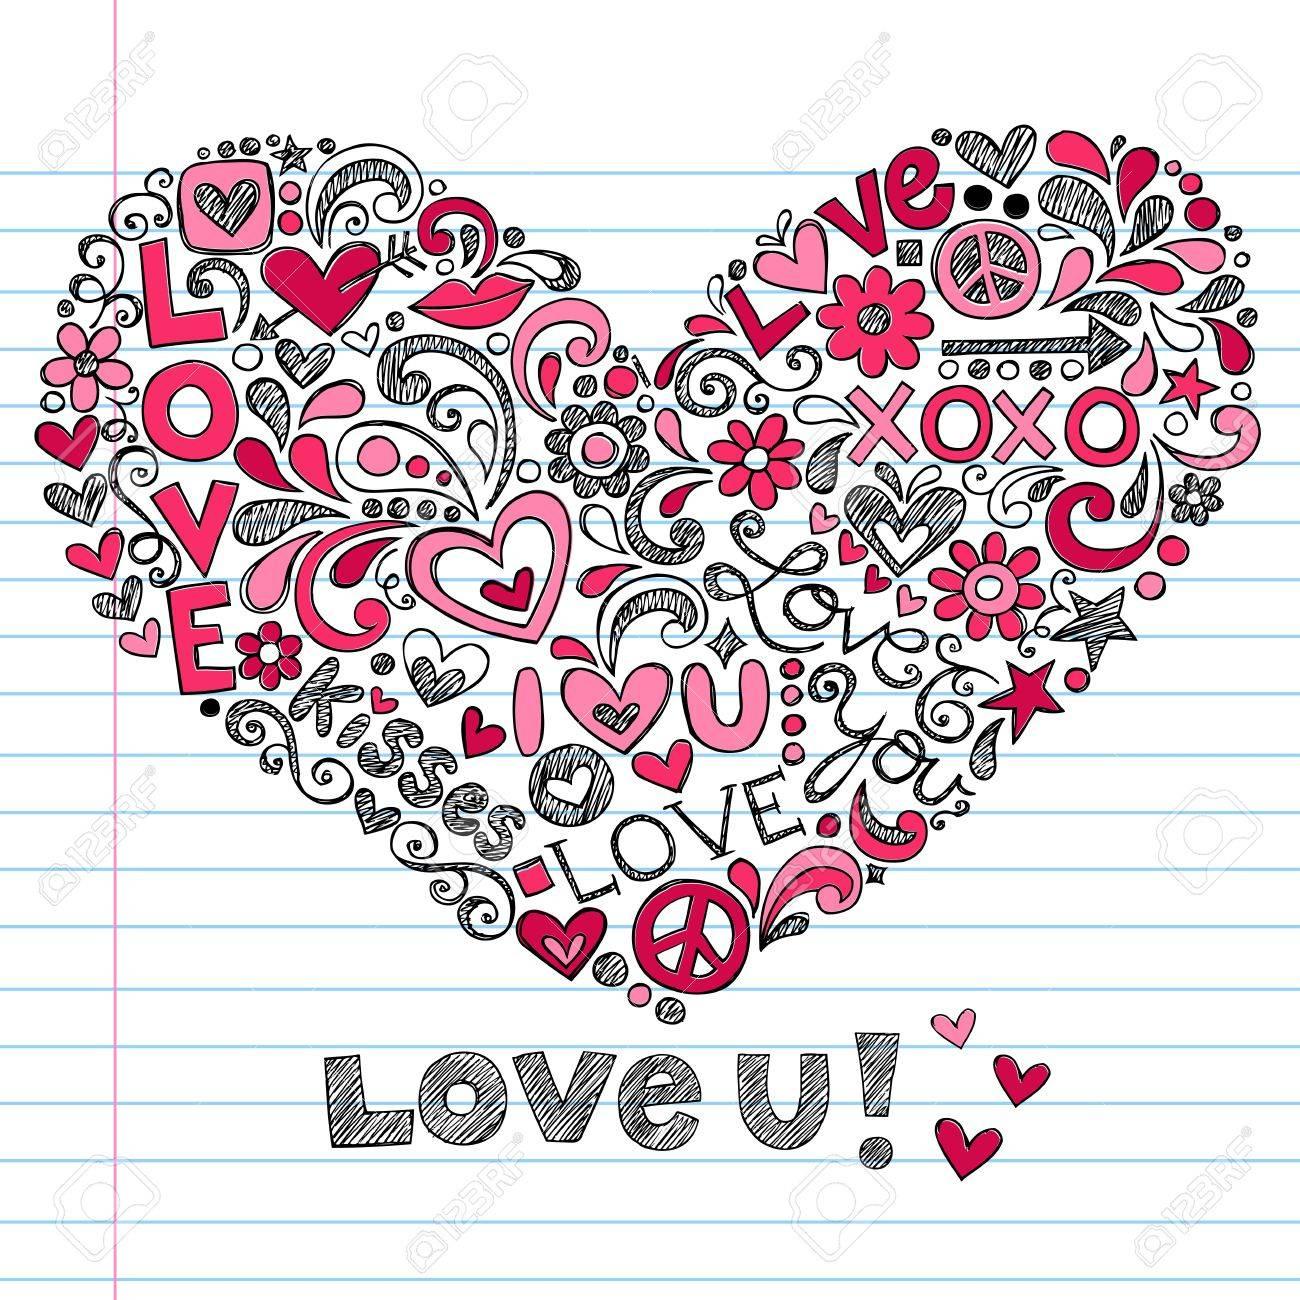 Heart Love Stock Vector - 16693314